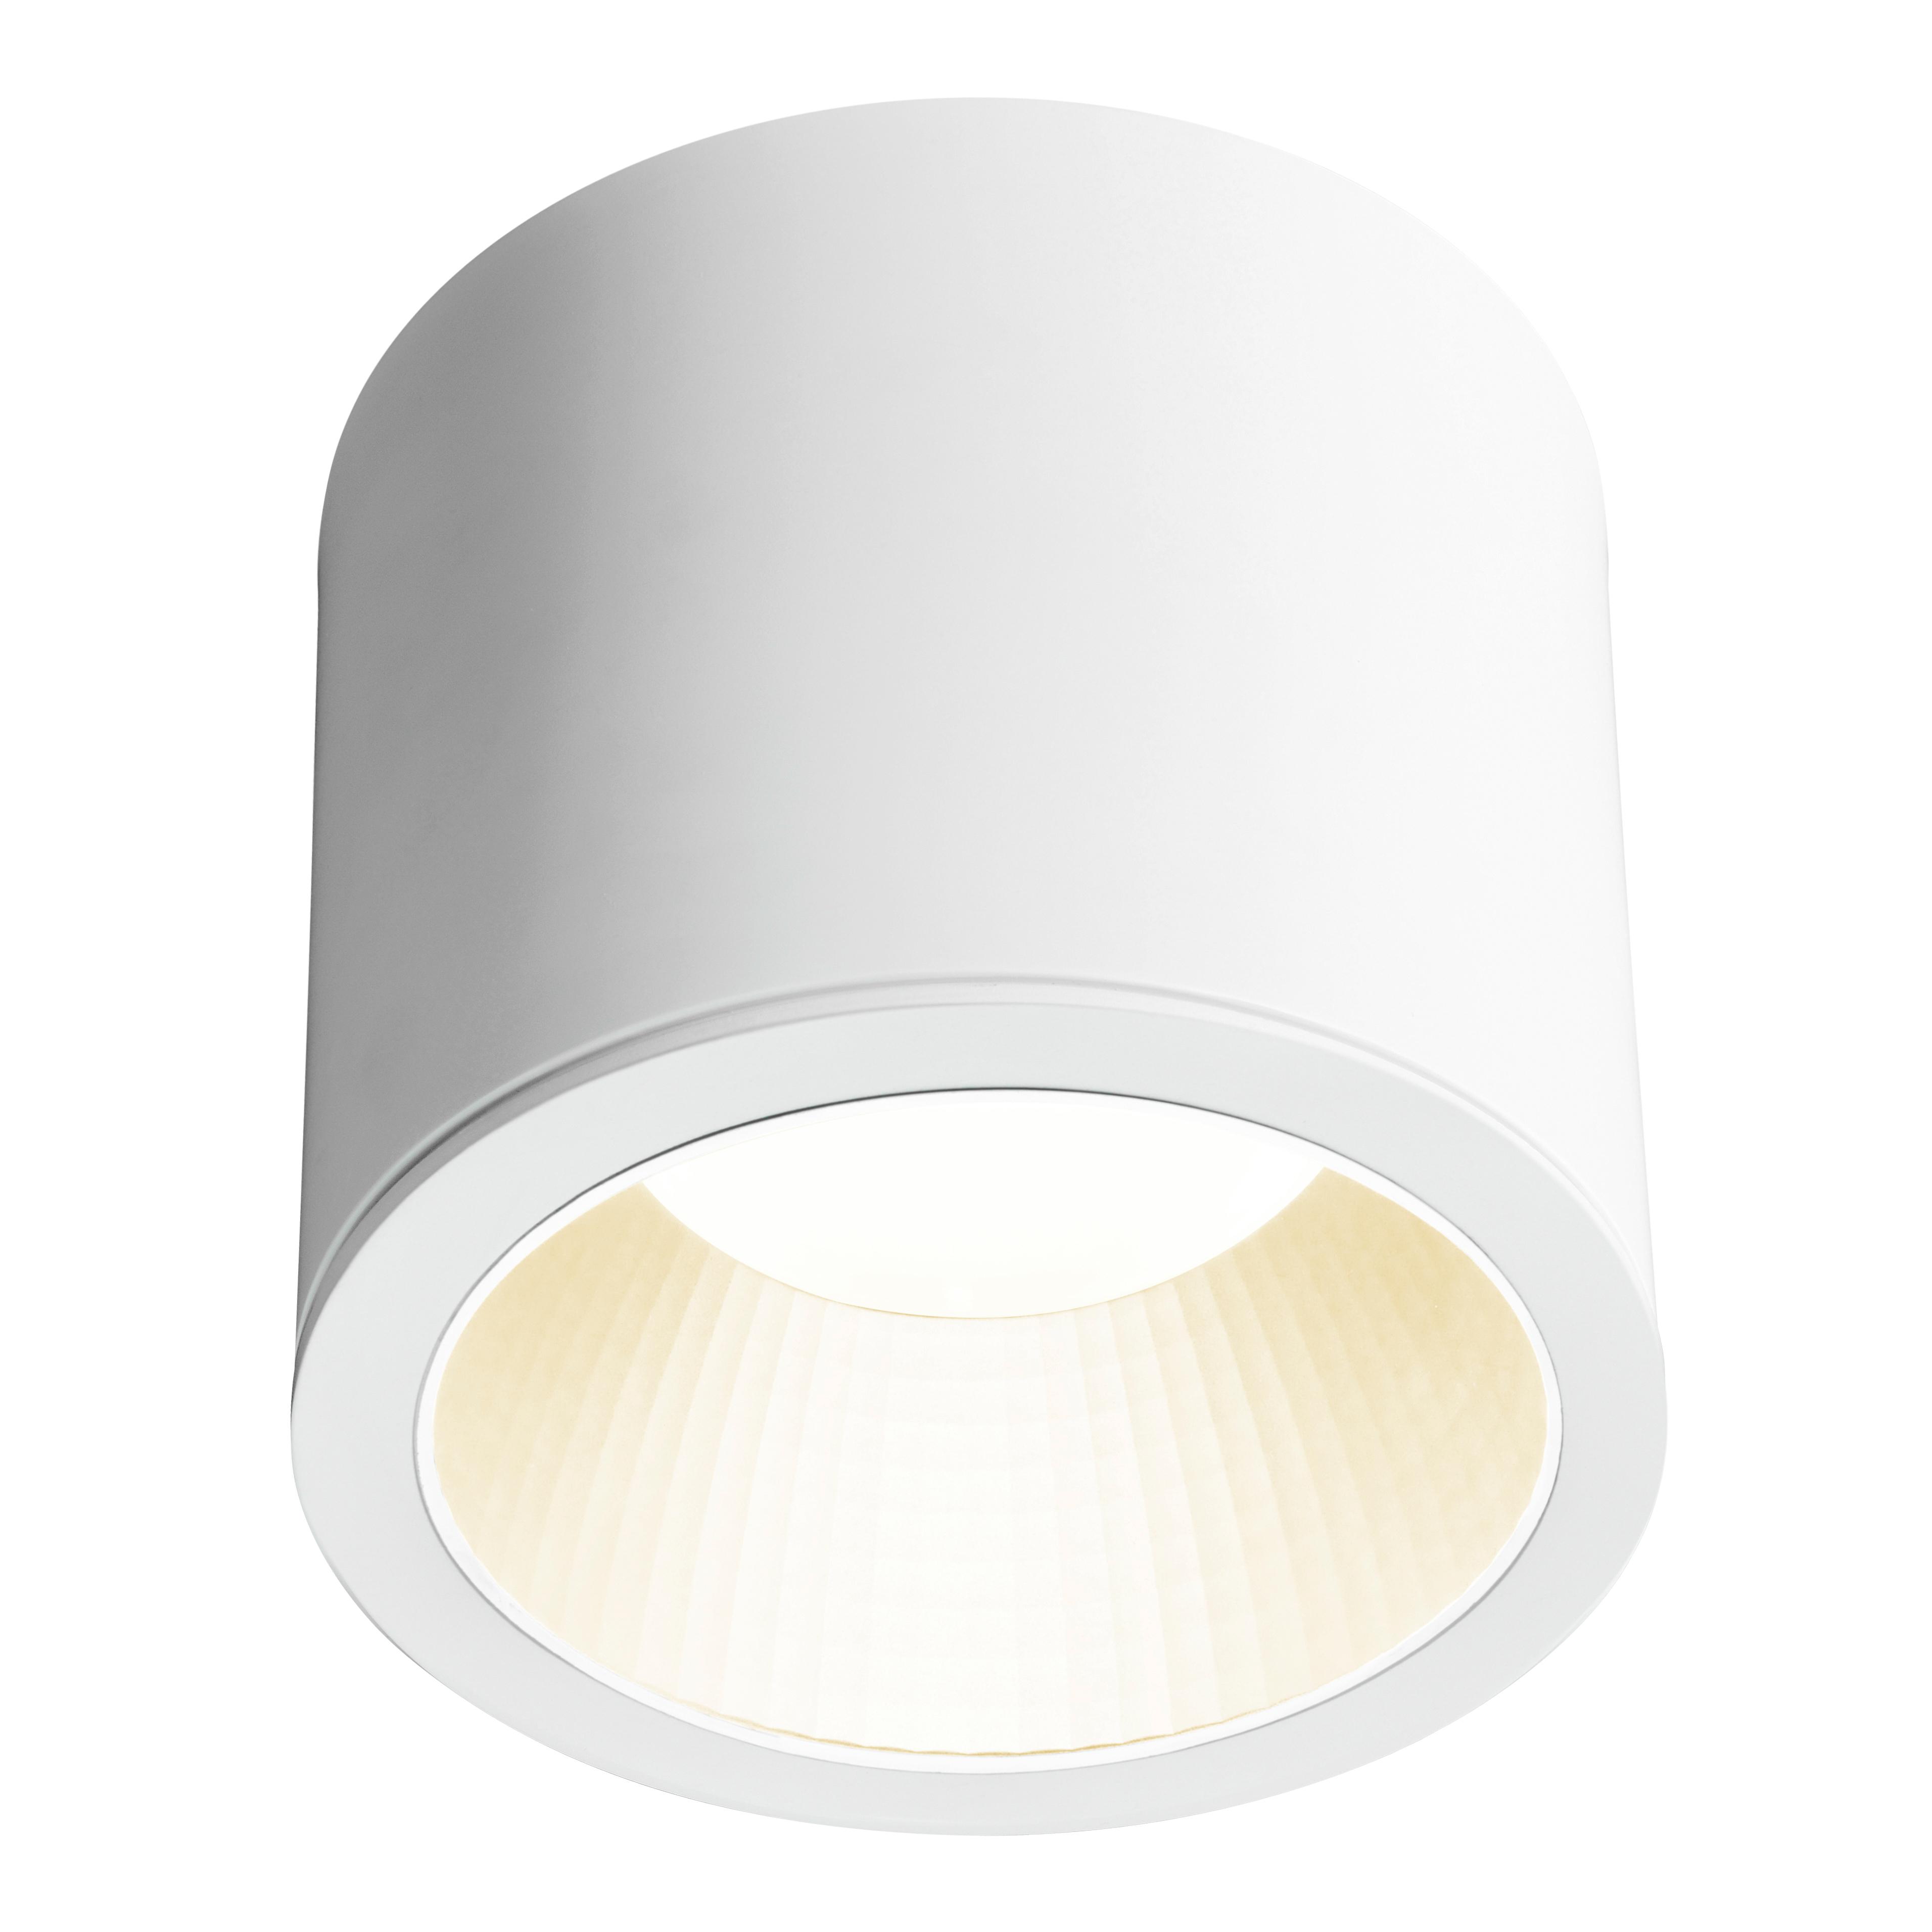 SOLINA 242 LED 44W 3950lm/830 MAT IP20 70° weiß GEN.2